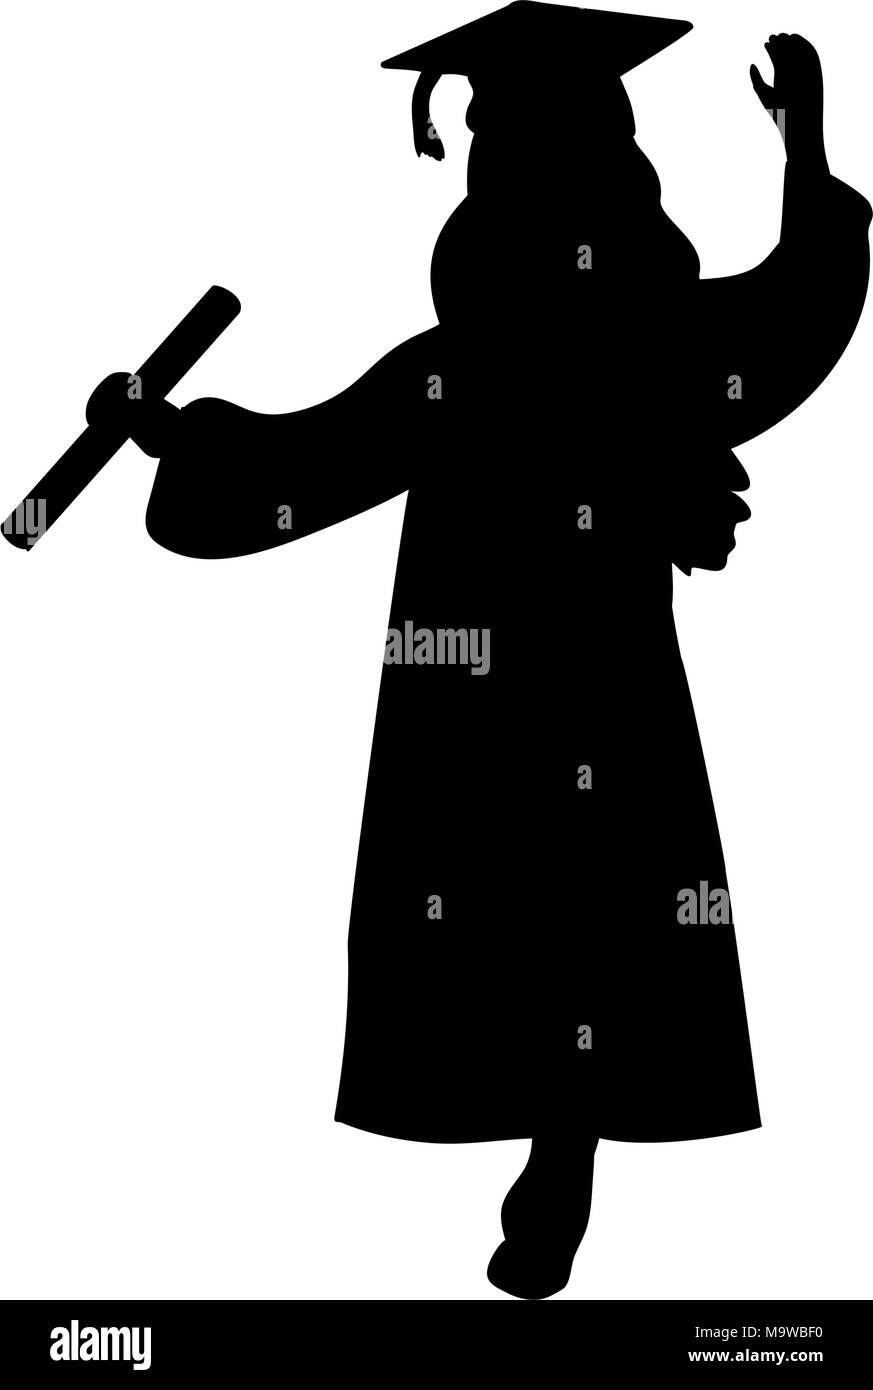 Graduation Silhouette Girl : graduation, silhouette, Silhouette, Graduation, Finished, Studying, Stock, Vector, Image, Alamy